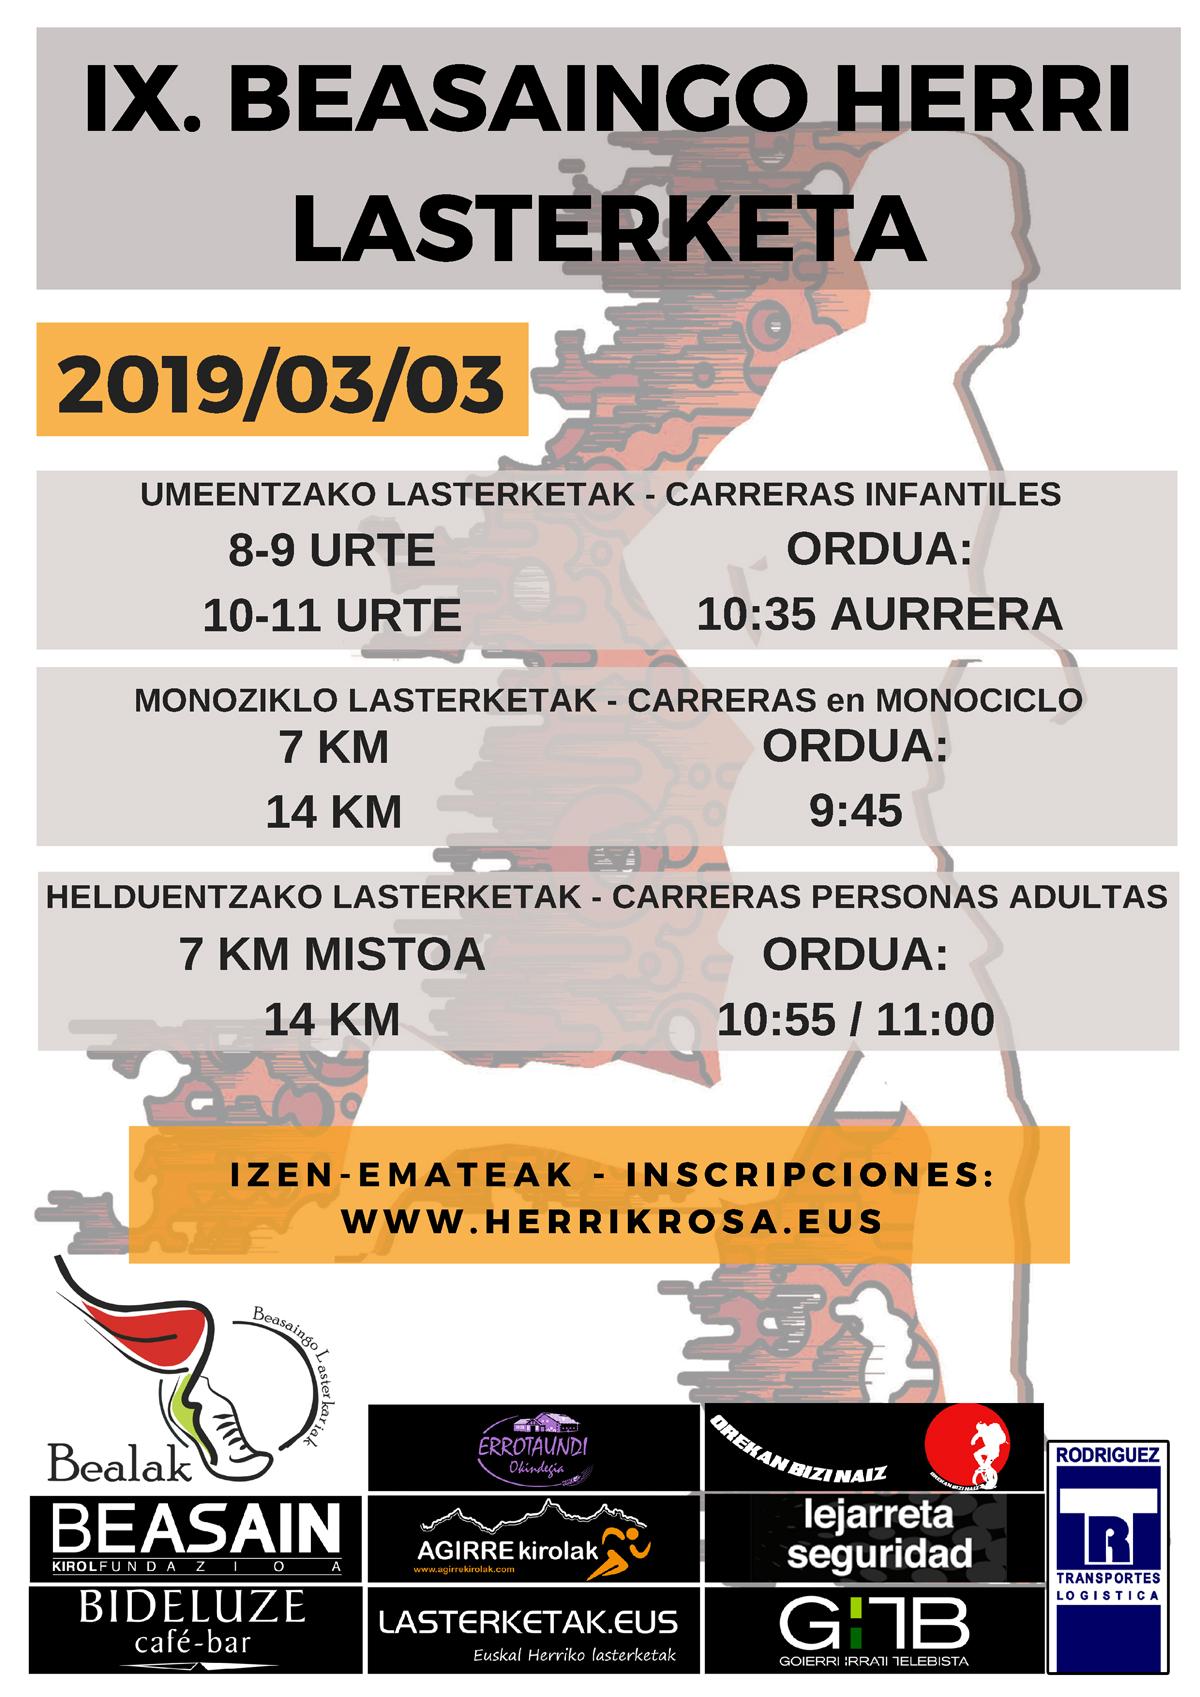 20190303_Beasaingo-Herri-Lasterketa-v1.jpg